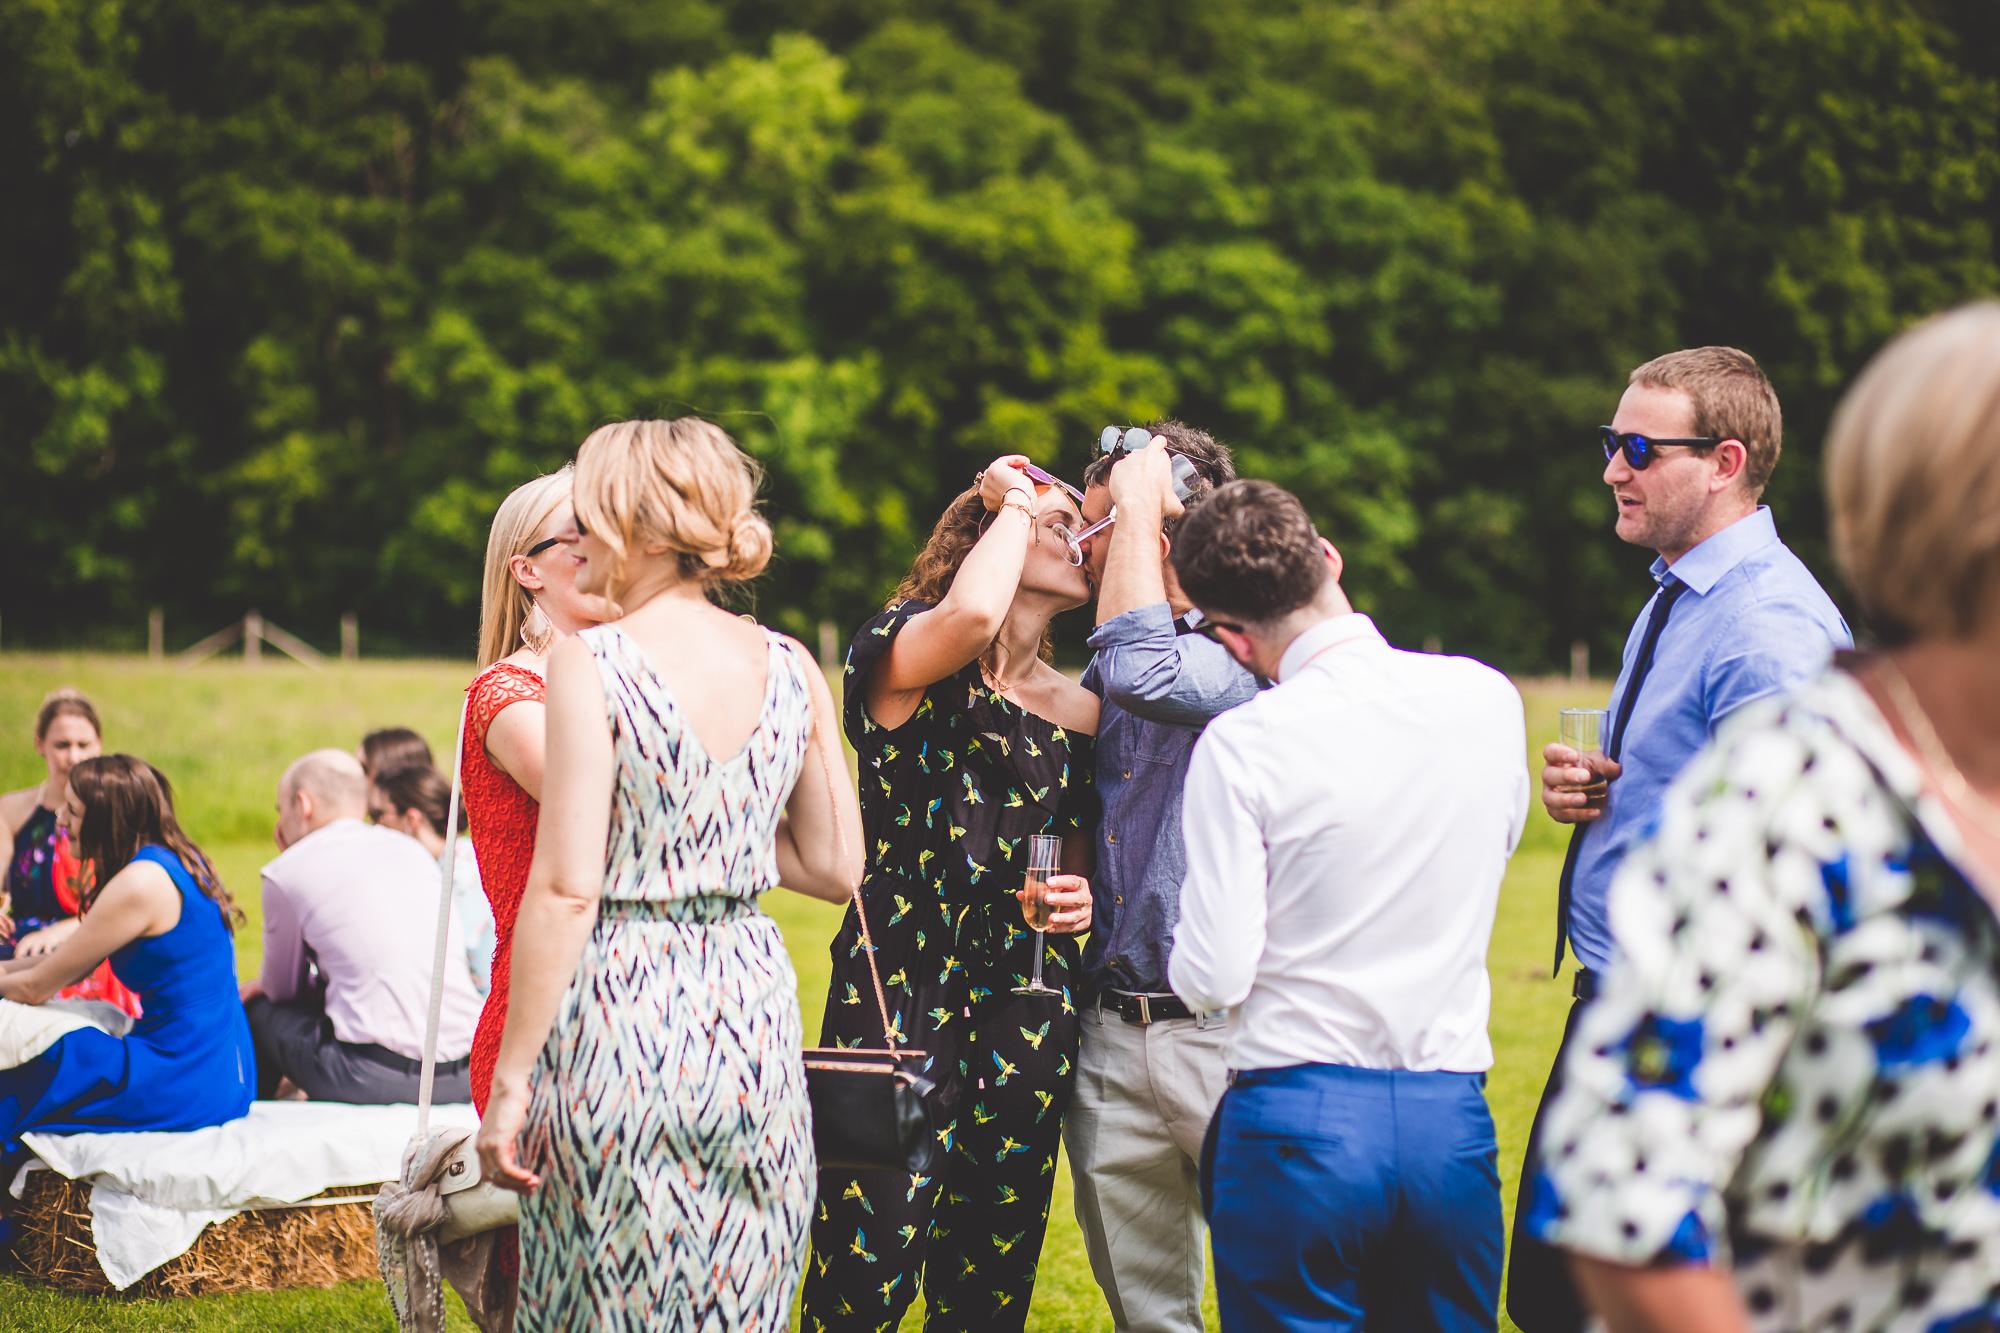 Veils & Bales Wedding Photography | Charlie & Steve SCSS 138